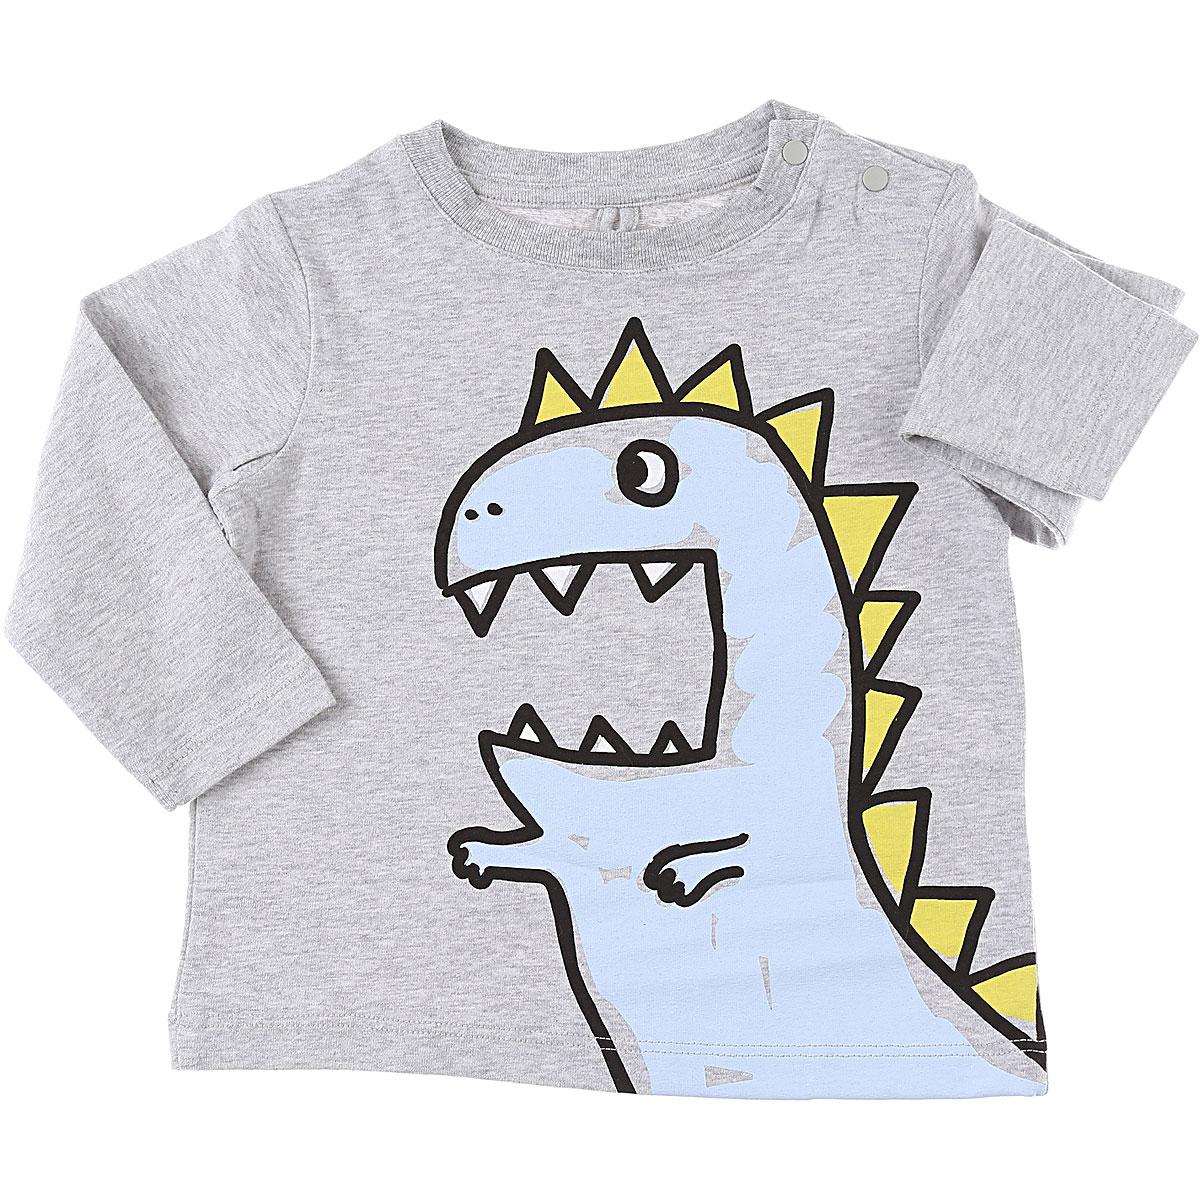 Stella McCartney Baby T-Shirt for Boys On Sale, Grey, Cotton, 2019, 12 M 18M 2Y 6M 9M